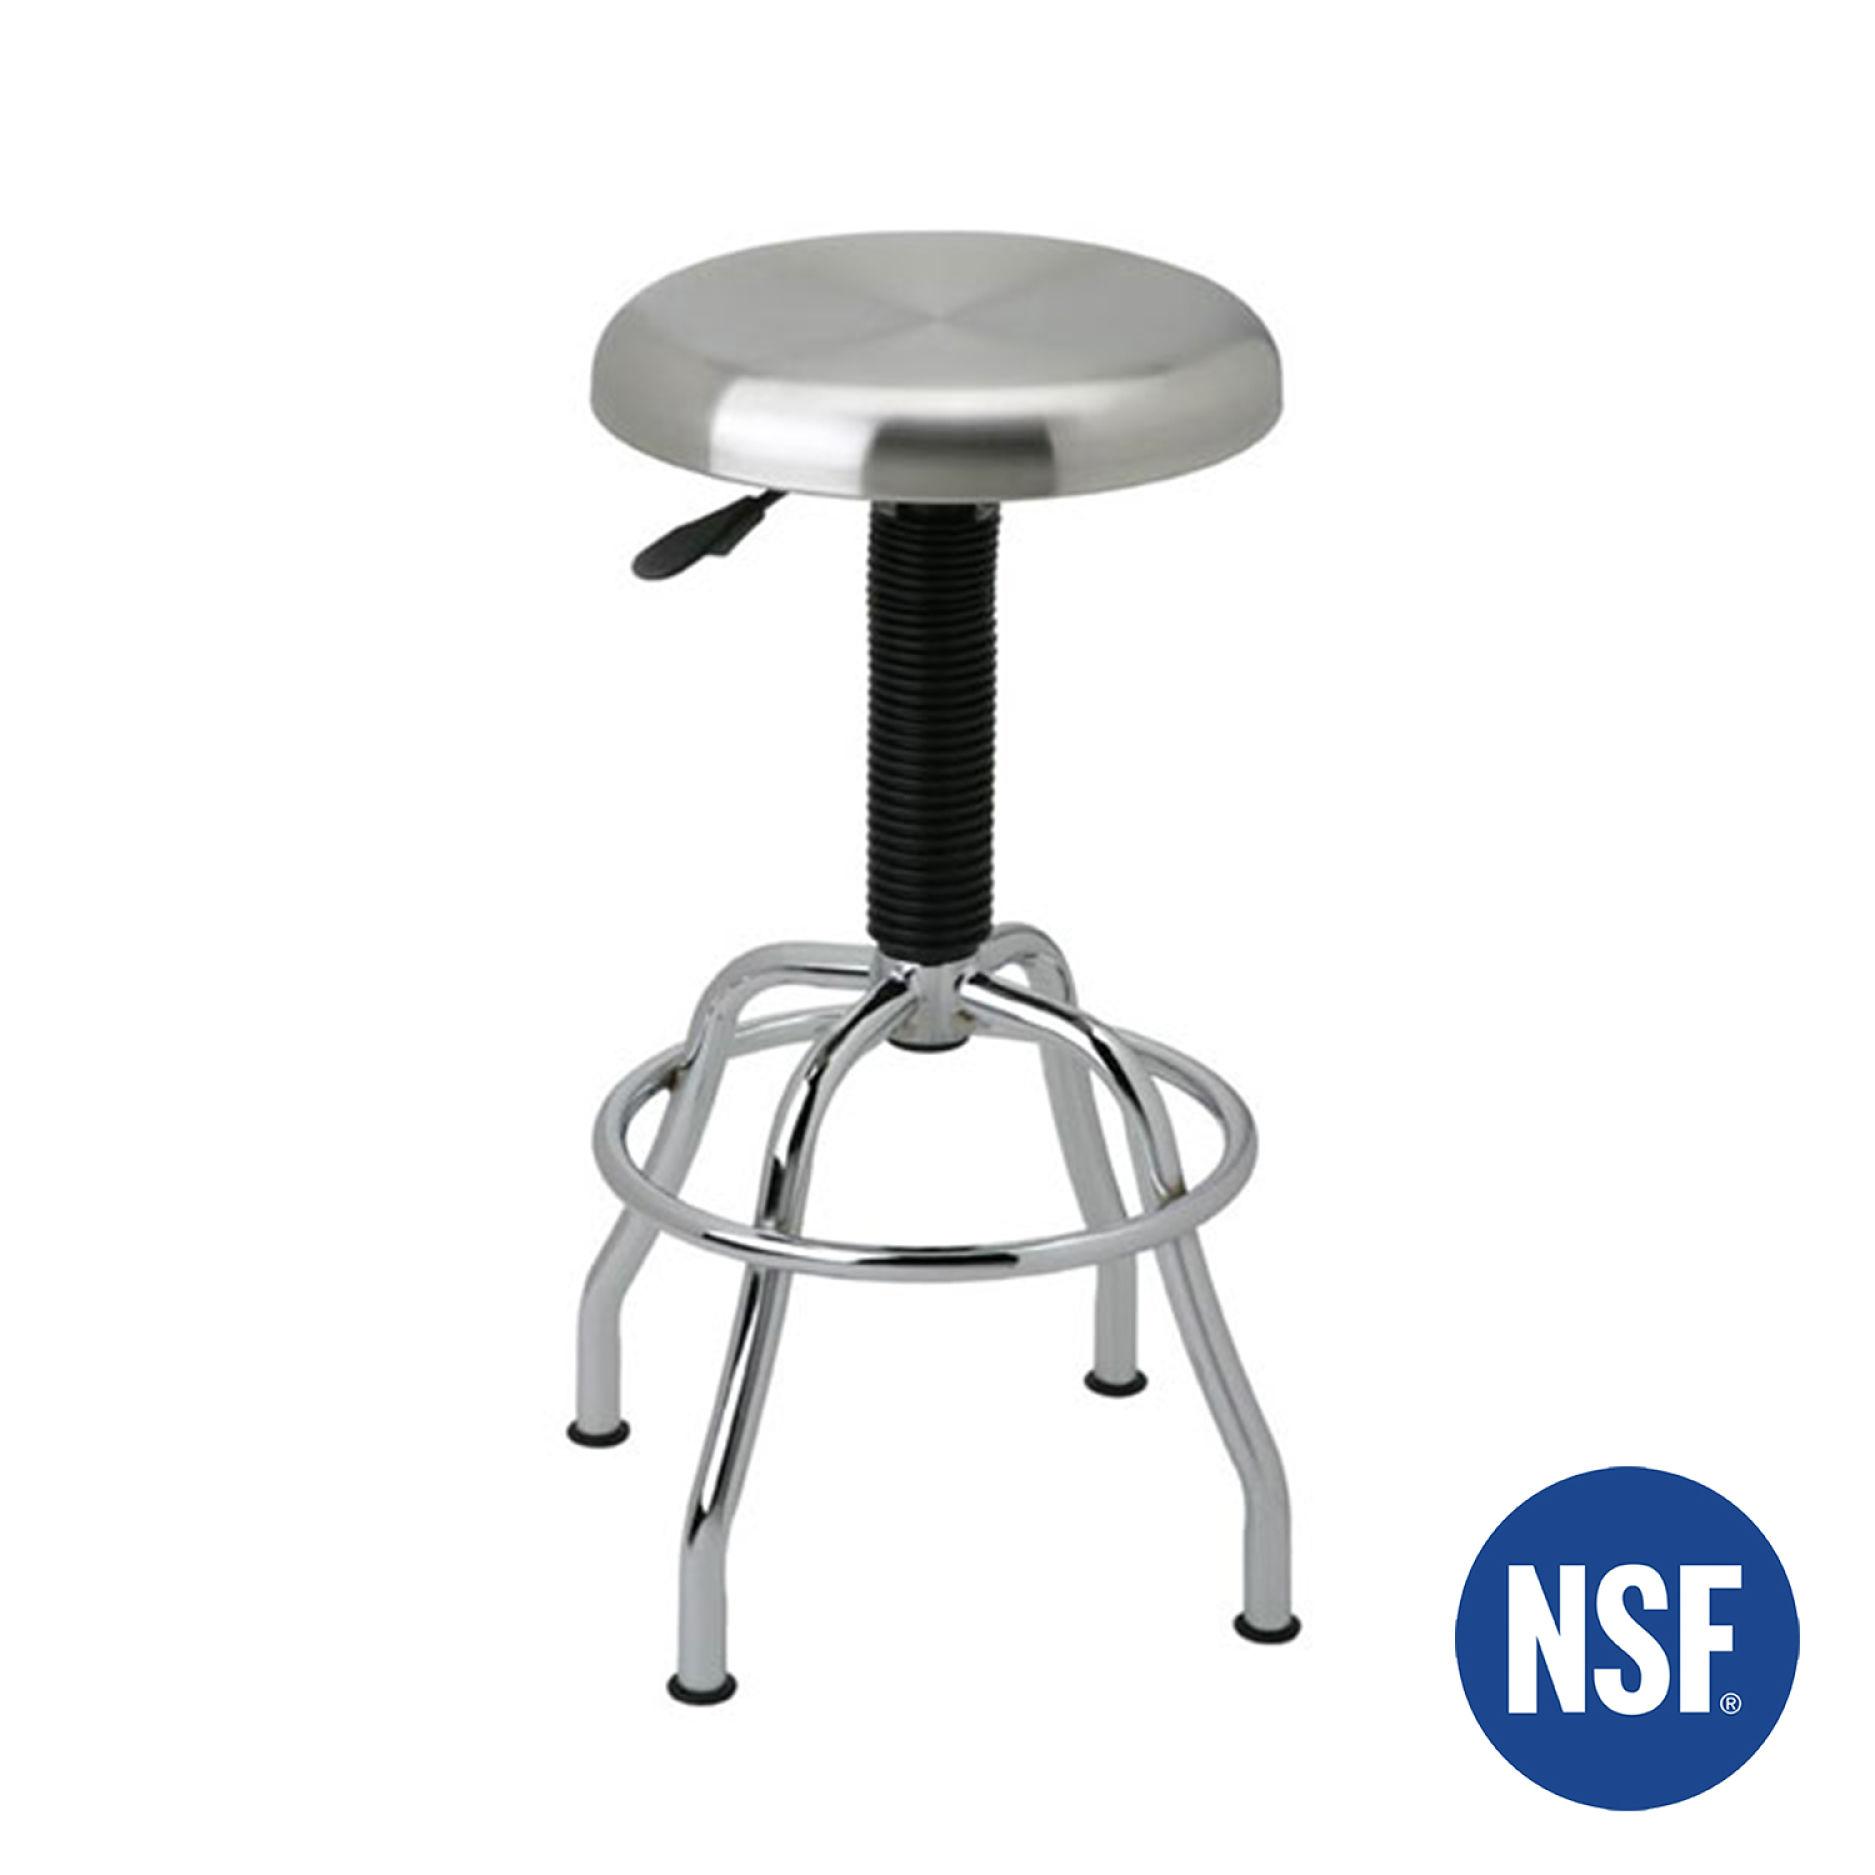 Work stool with ergonomic properties